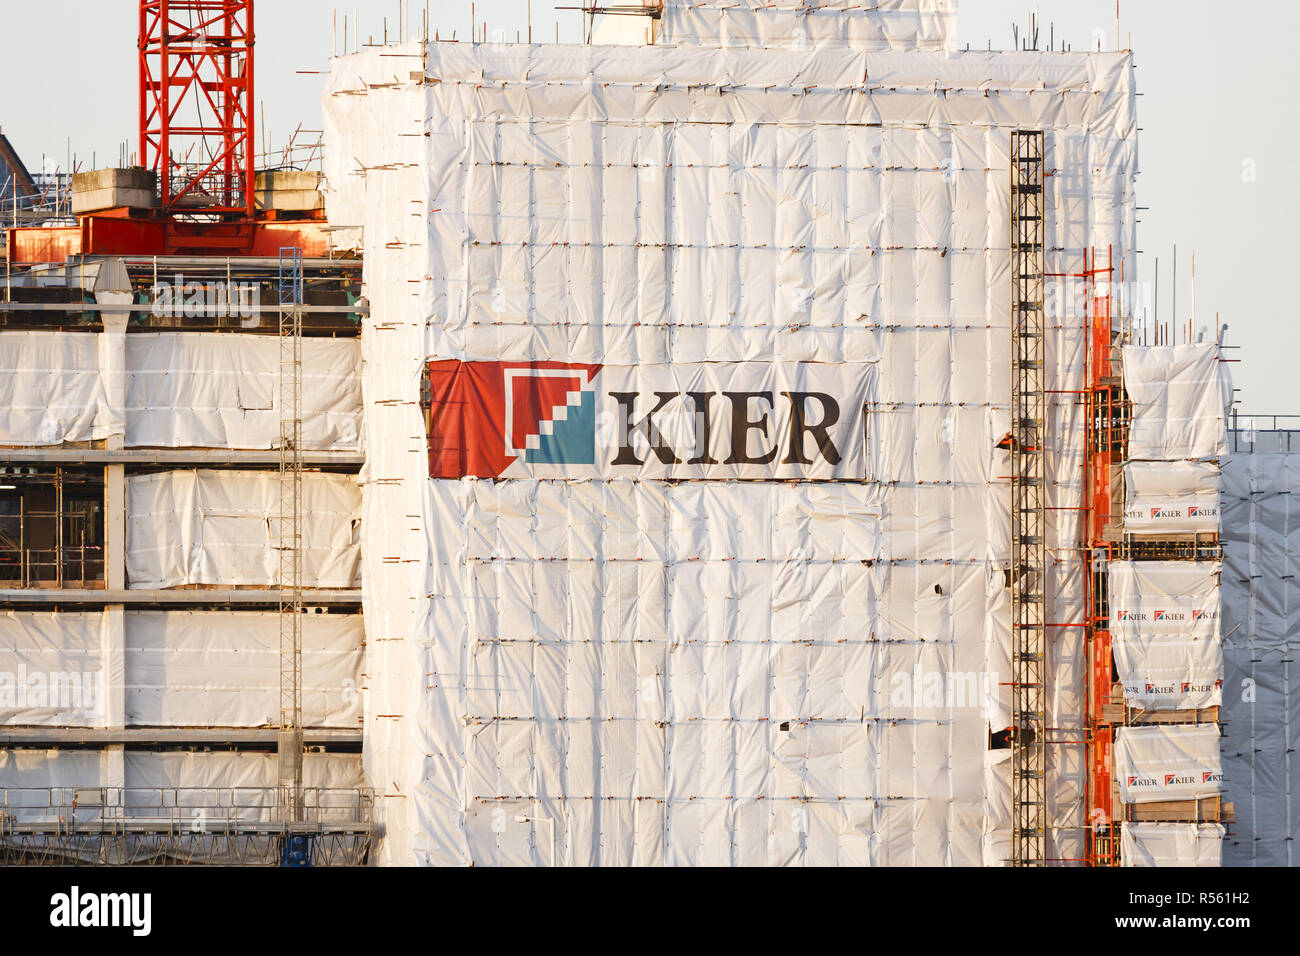 London, UK - January 06, 2012. Building under construction by Kier Group. Kier Group Plc is a construction and property company headquartered in the U - Stock Image